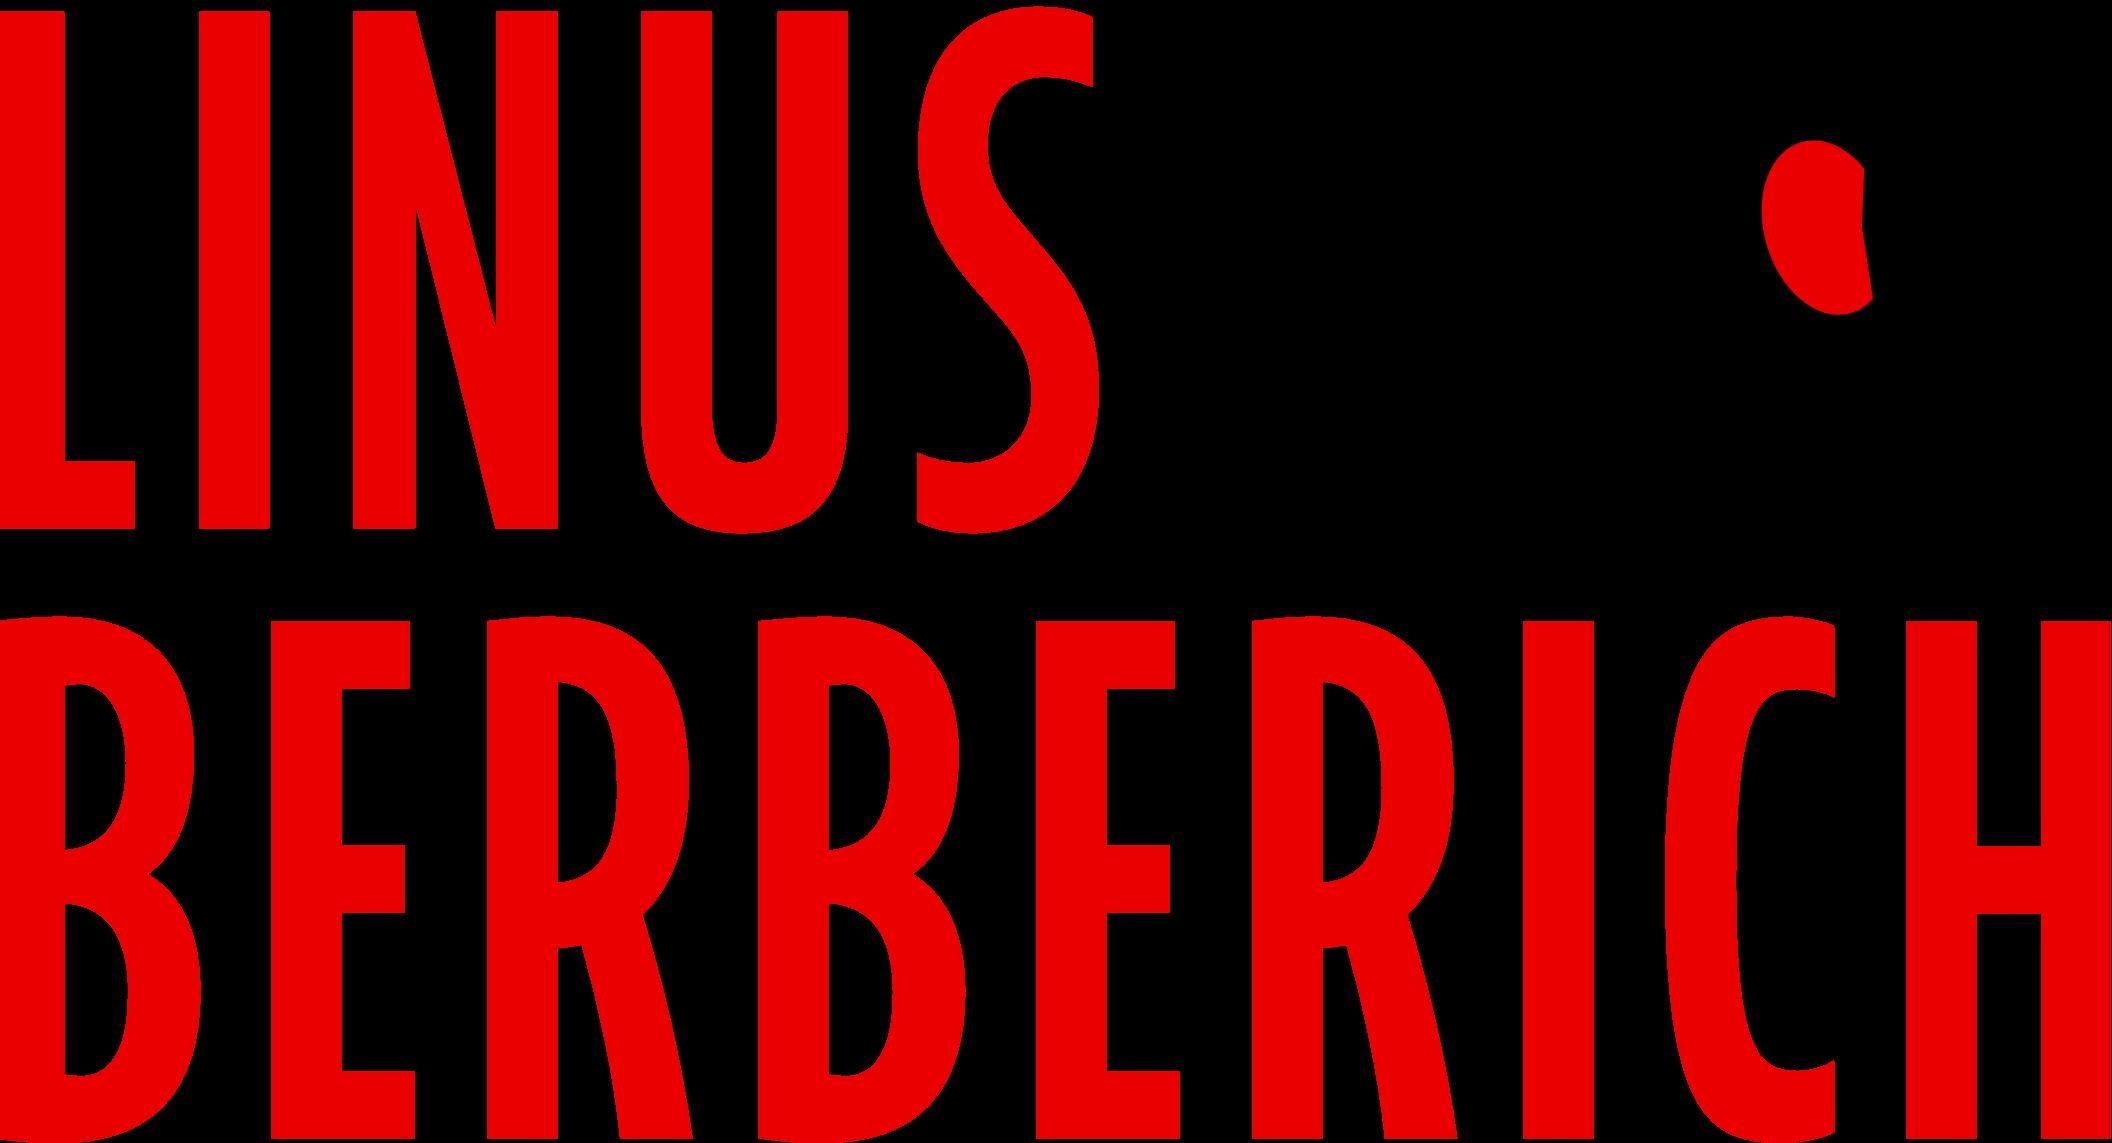 Linus Berberich